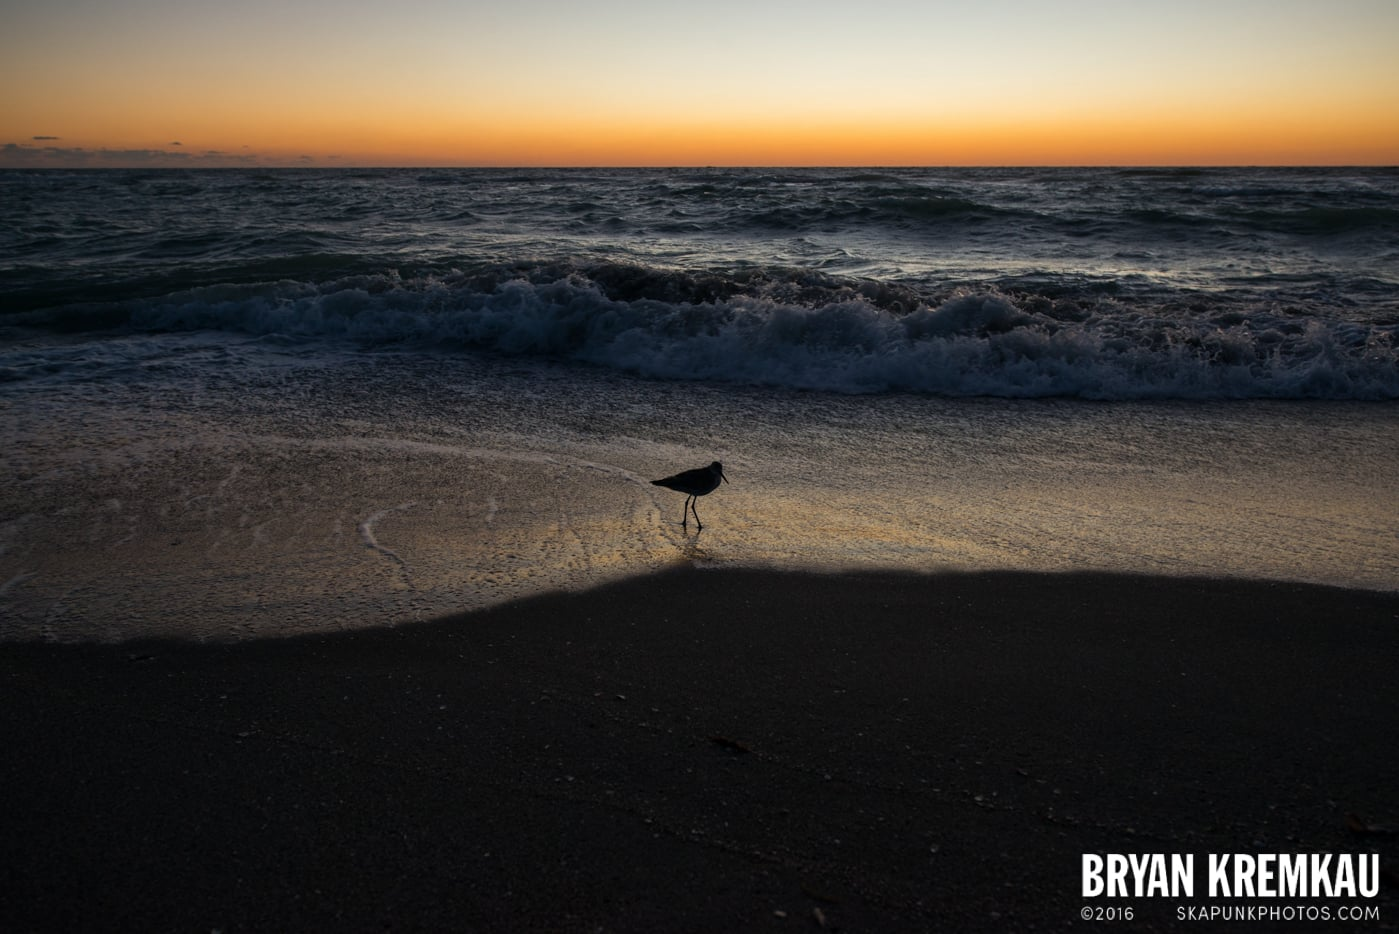 Sunsets, Astrophotography & Birds @ Venice, Florida - 10.25.14 - 11.5.14 (92)